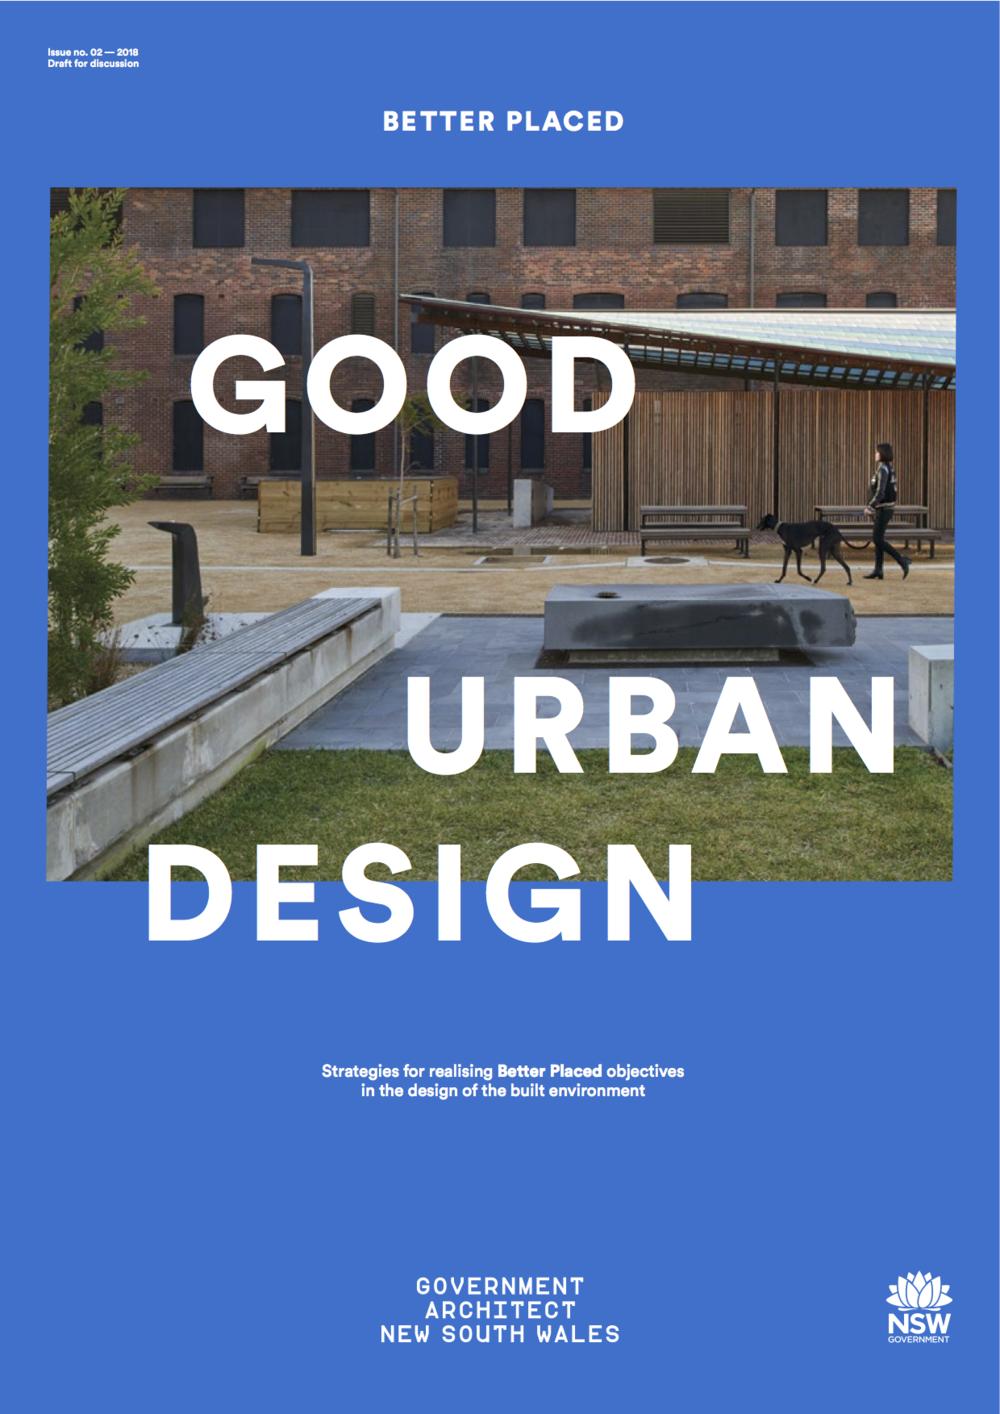 Draft Good Urban Design Better Placed